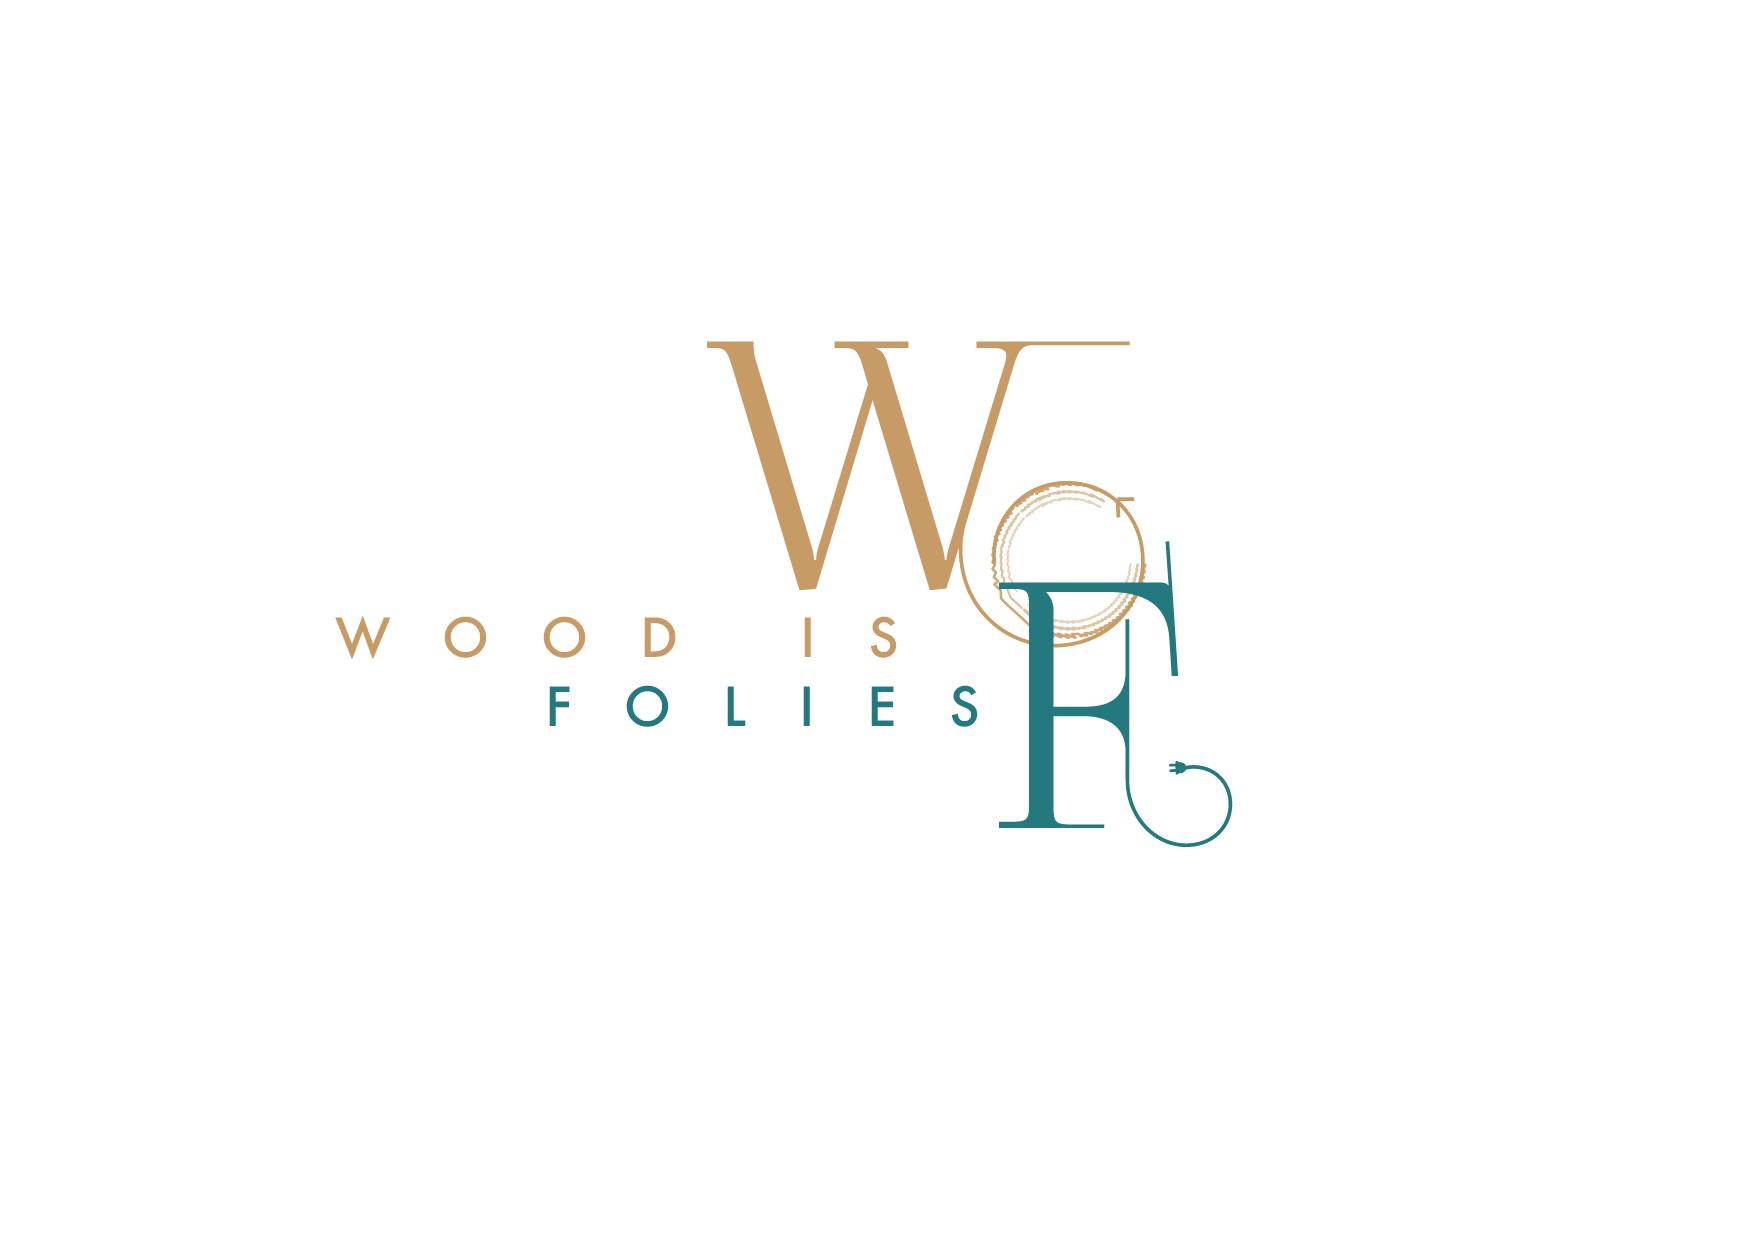 Wood Is Folies